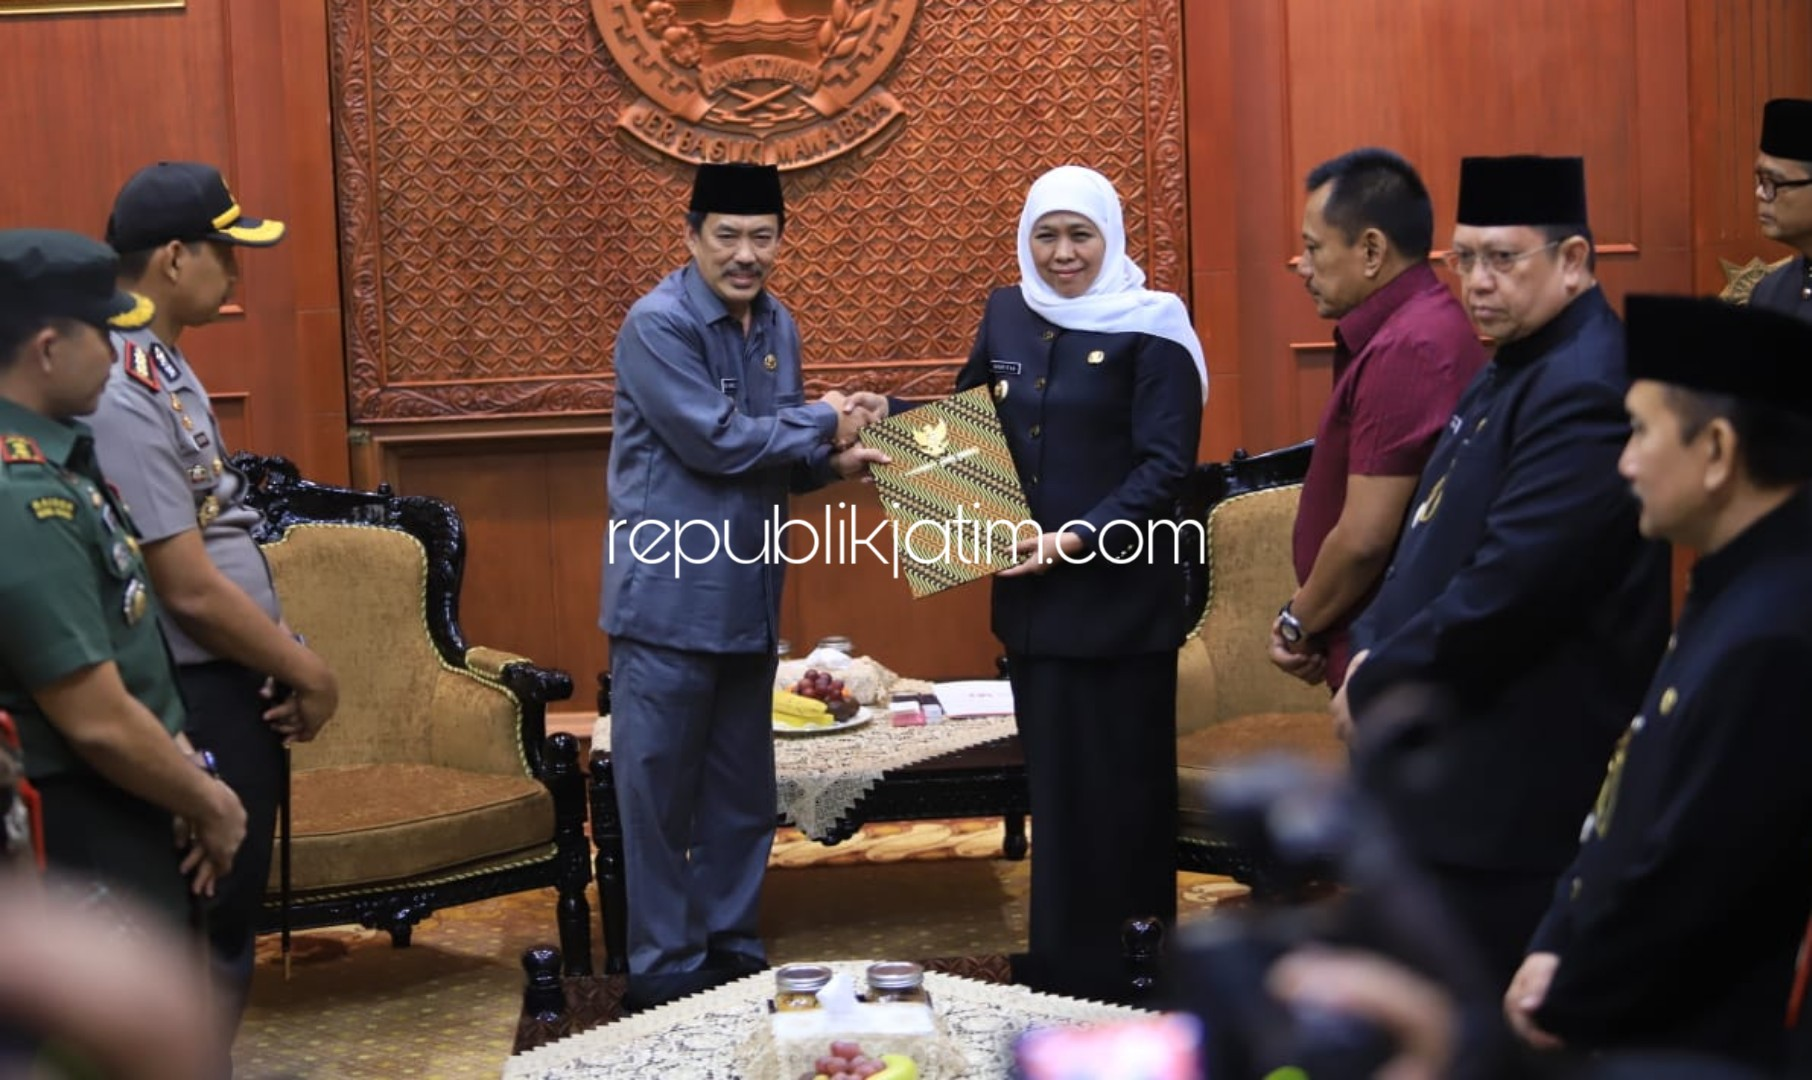 Bupati Terjerat OTT KPK, Kemendagri Tunjuk Cak Nur Jabat Plt Bupati Sidoarjo